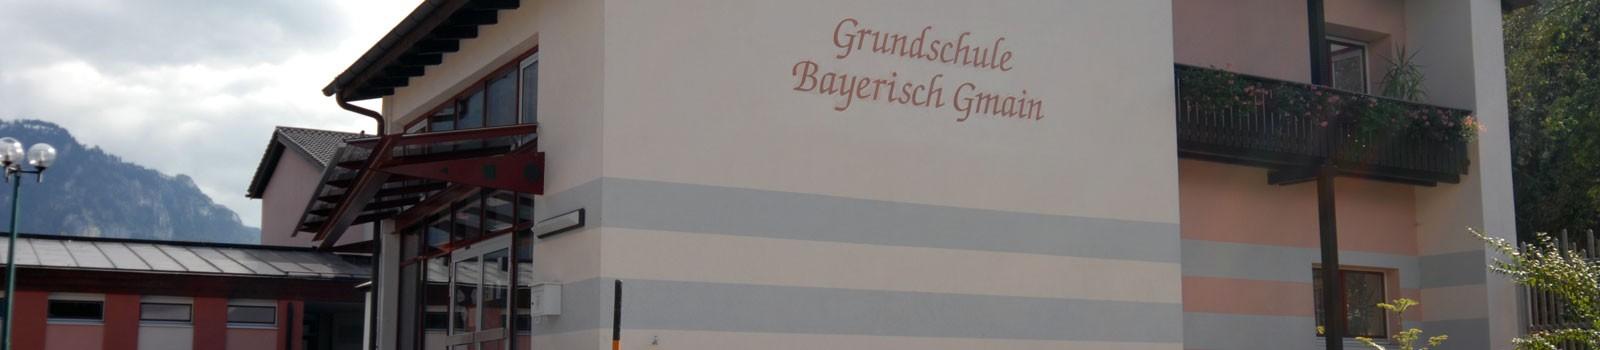 Grundschule Bayerisch Gmain